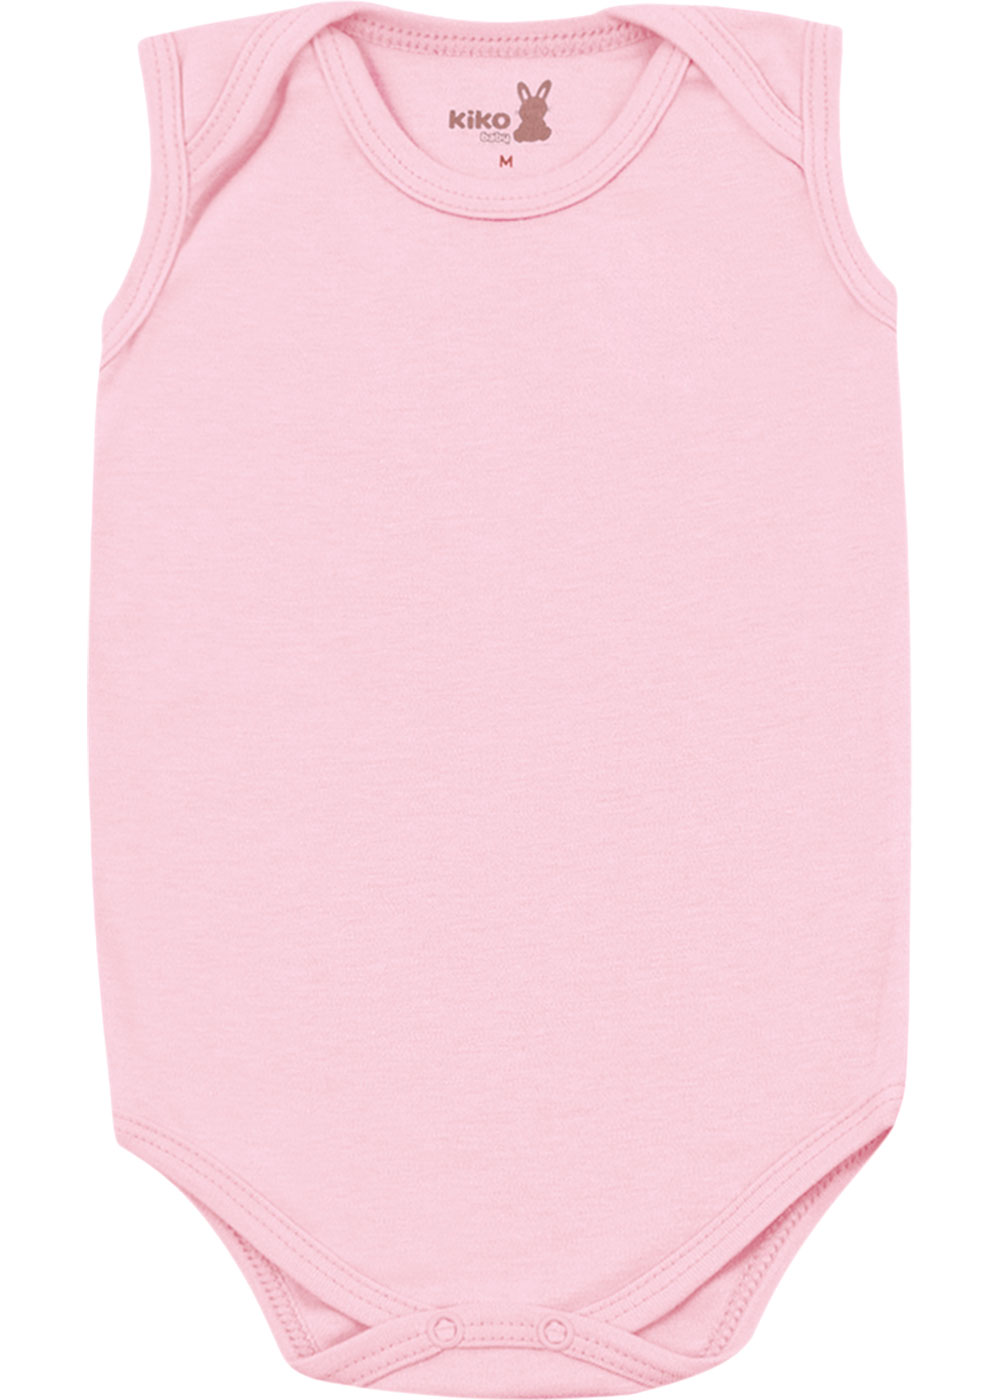 Body Bebê Feminino Verão Kit 3 Rosa Lisos - Kiko e Kika